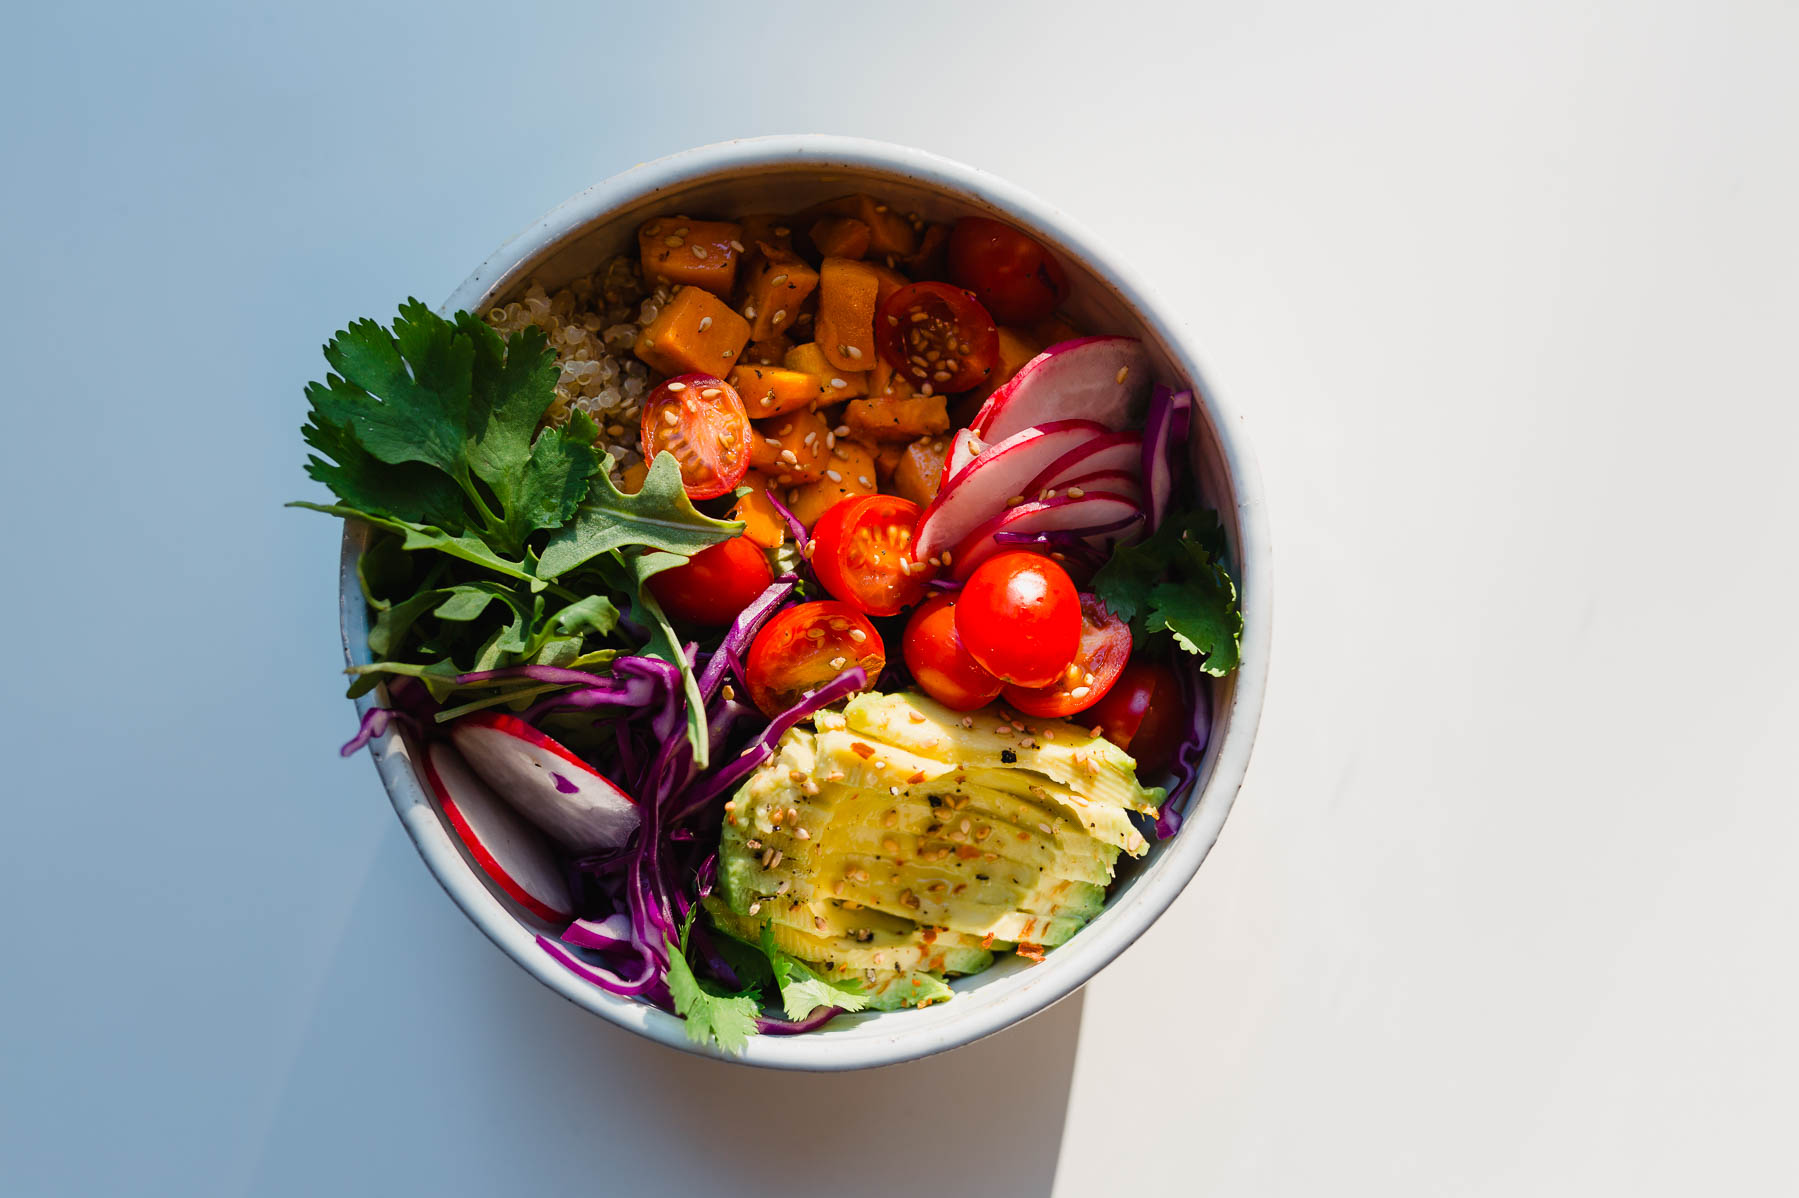 chicago-food-photographer-1.jpg